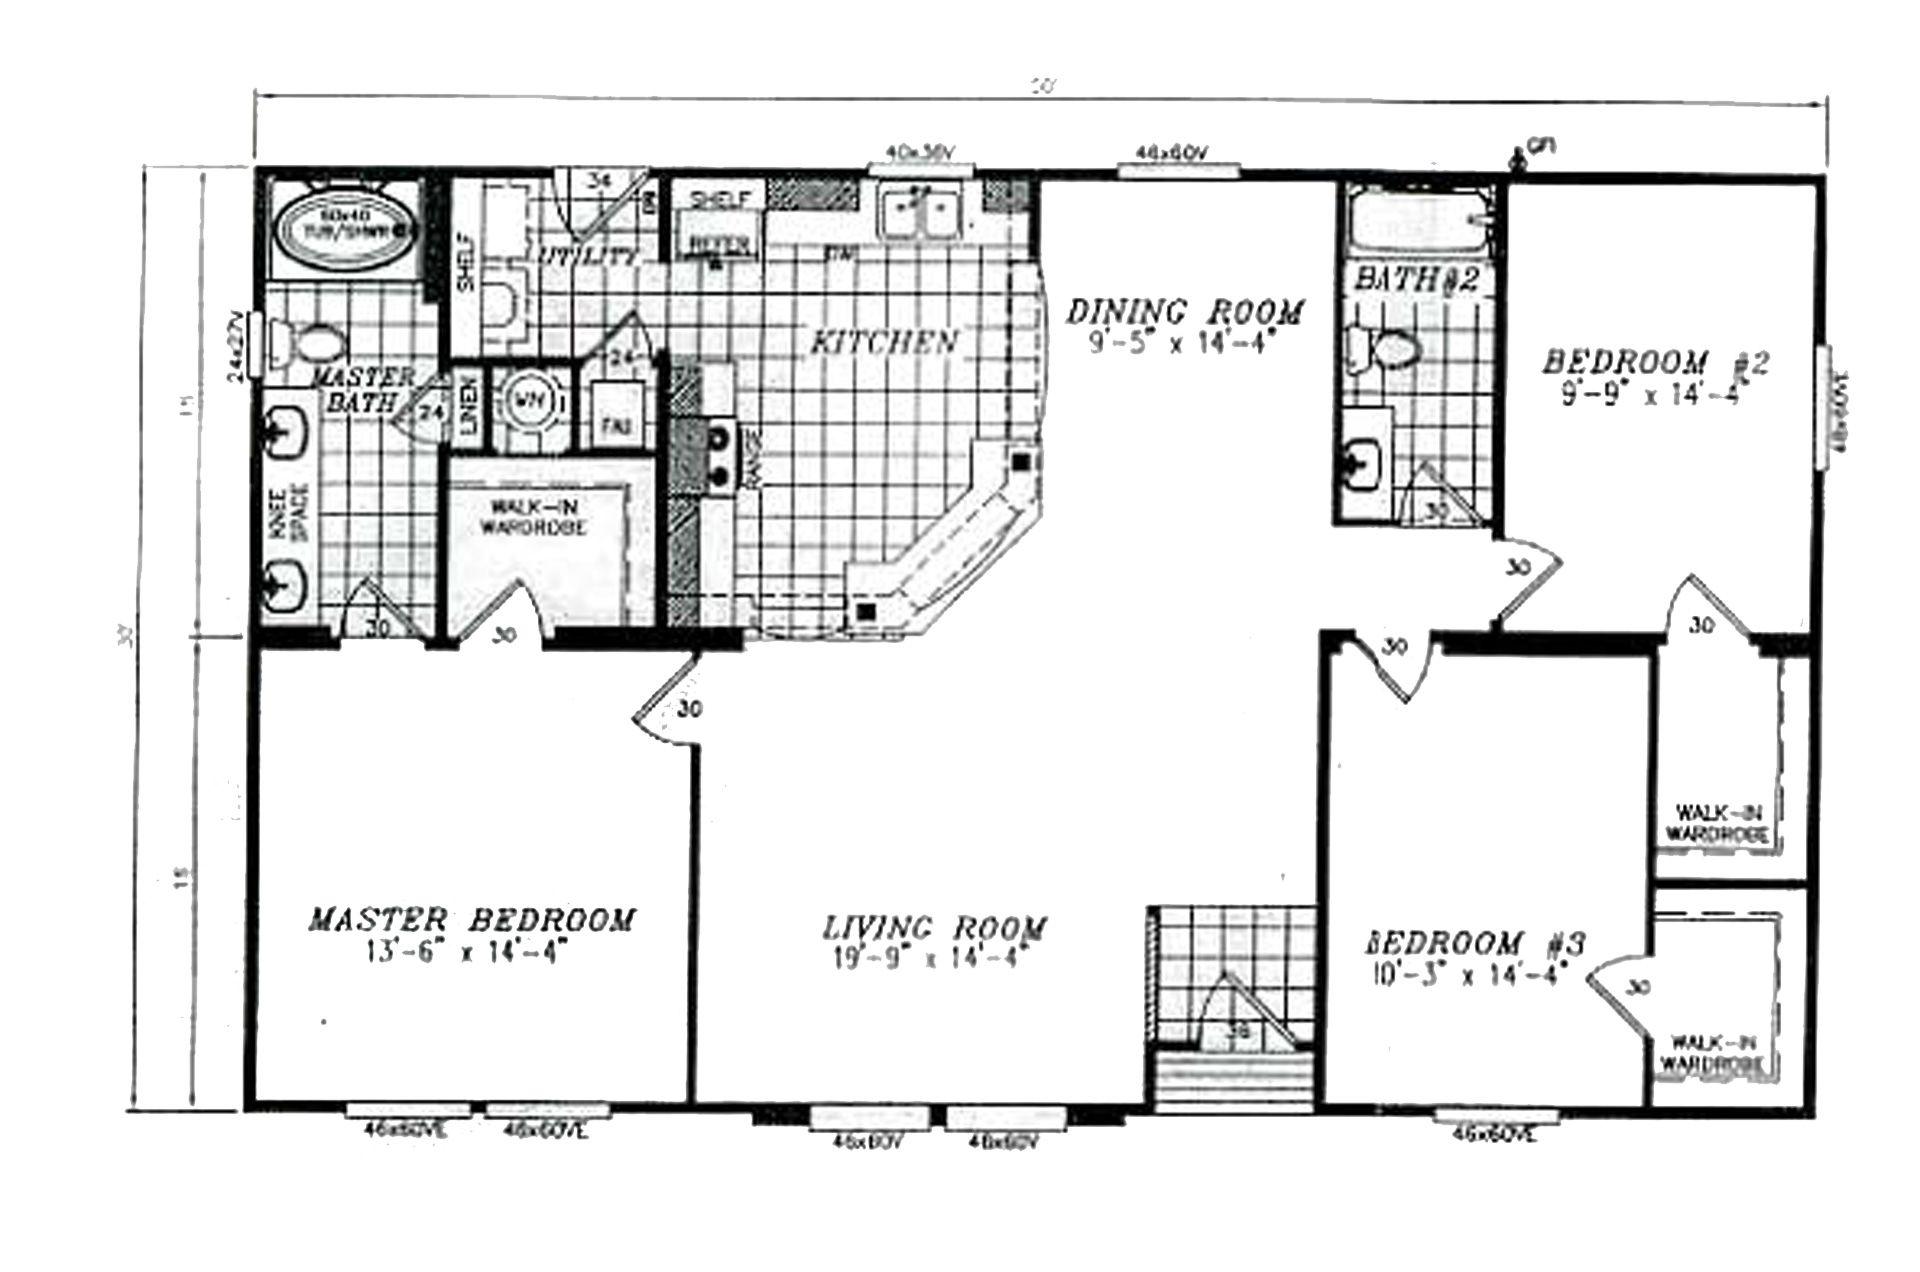 Charming 30x60 House Floor Plans #10: Manufactured Home Floor Plan - 2008 KARSTEN Cl-250a 94CLS30503AH08 .